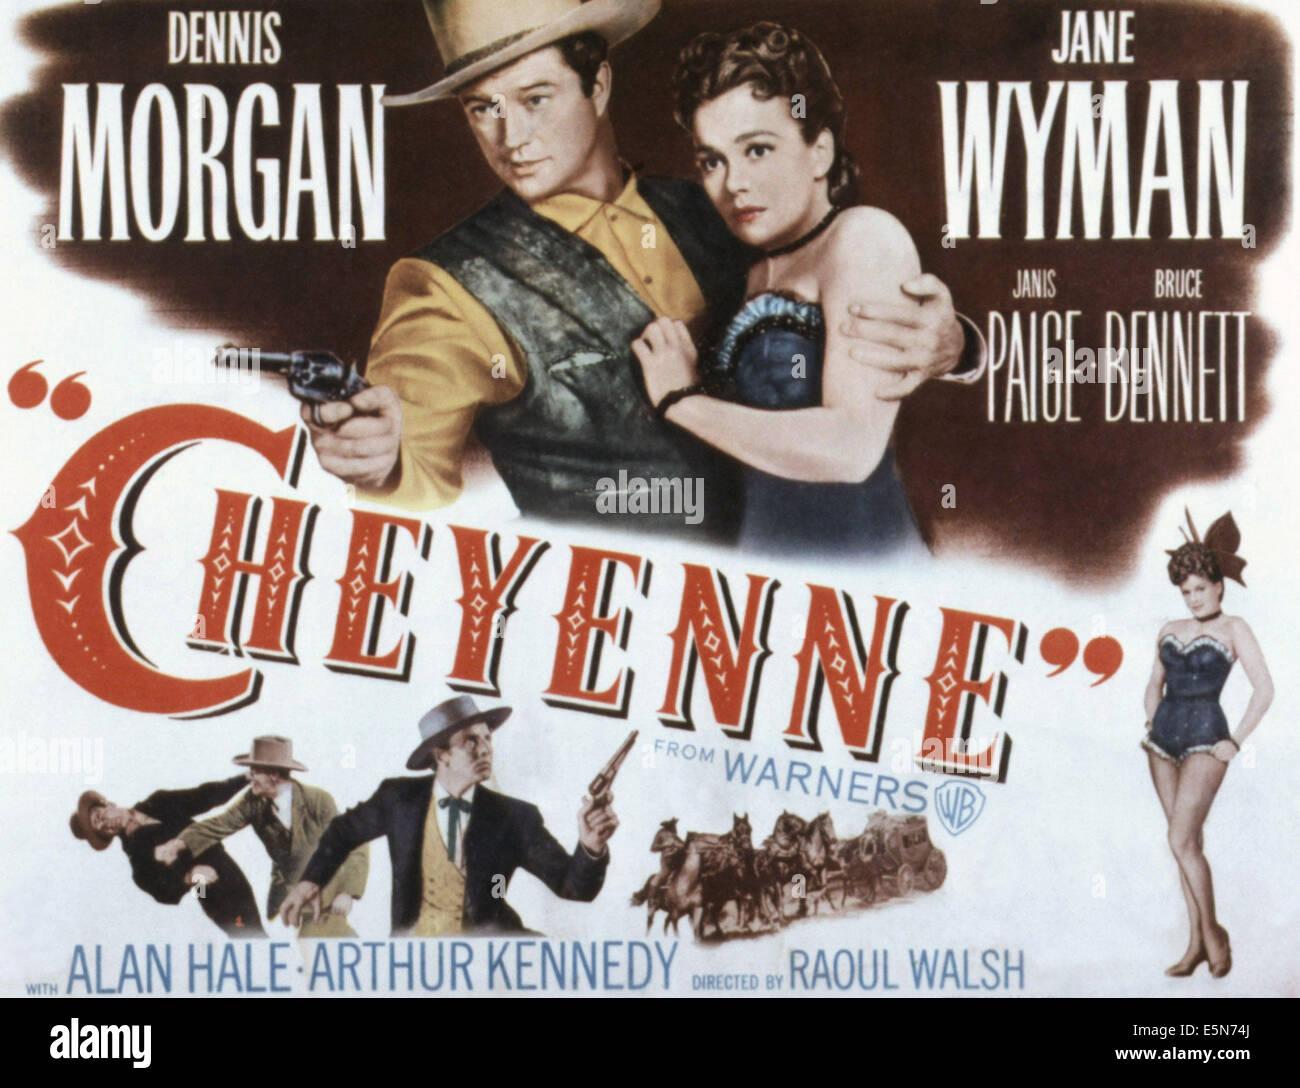 Cheyenne Dennis Morgan vintage movie poster print